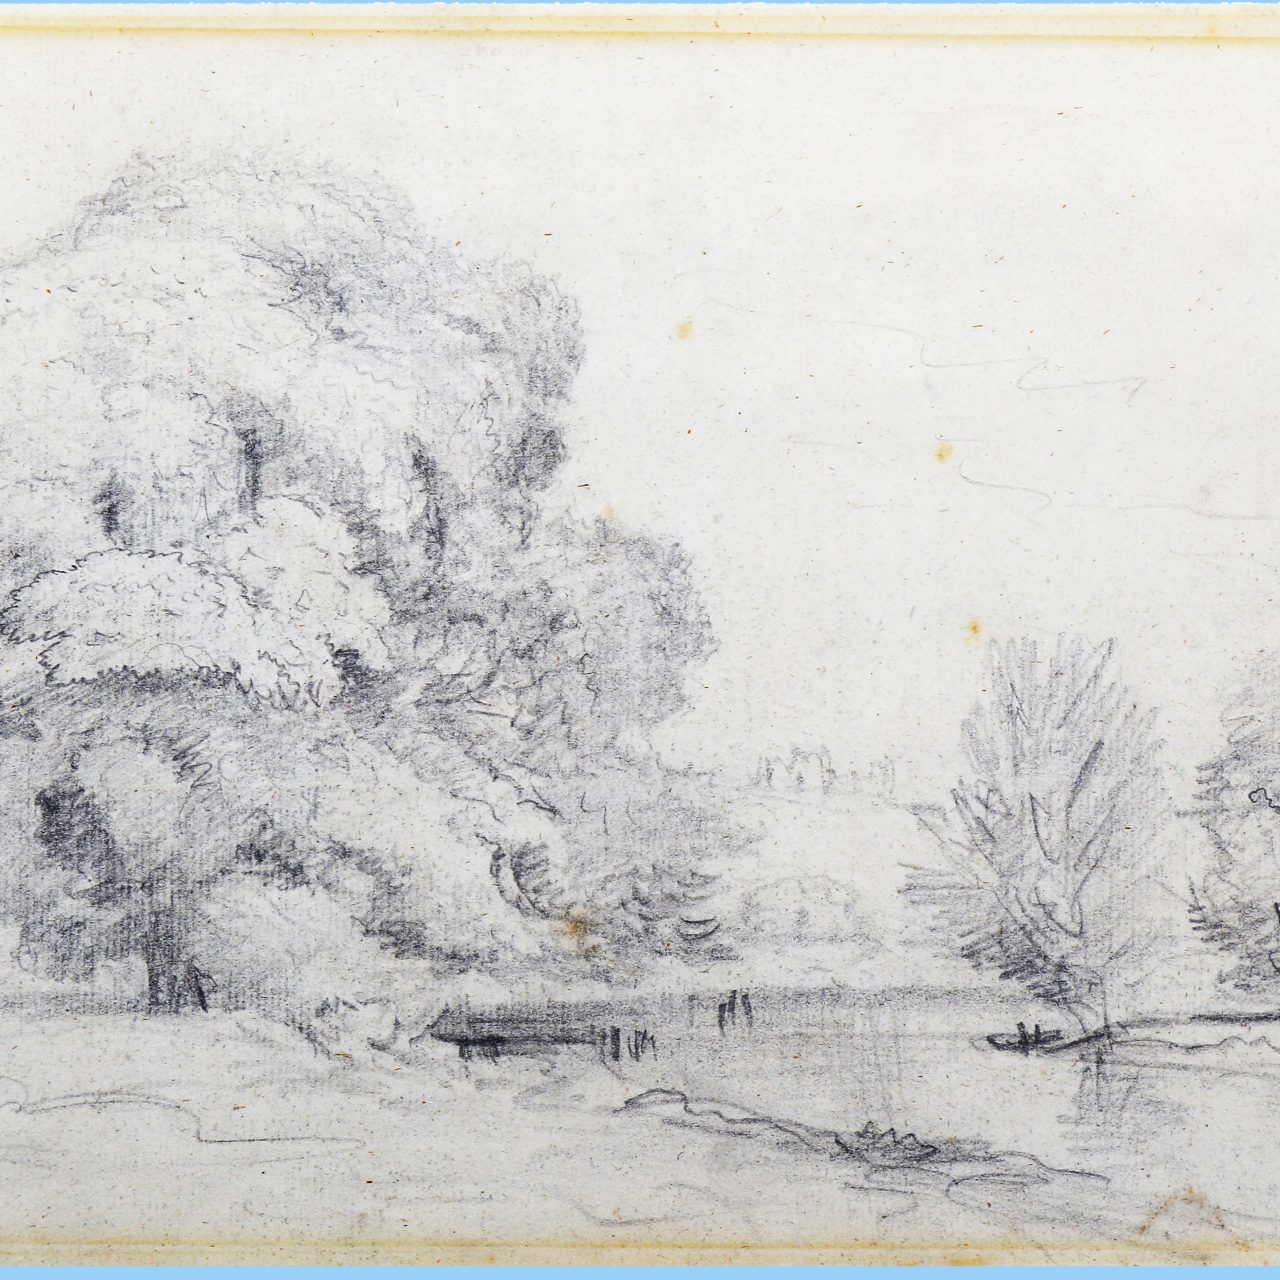 John Constable Landscape Sketch Sells for 14 Times Its Estimate